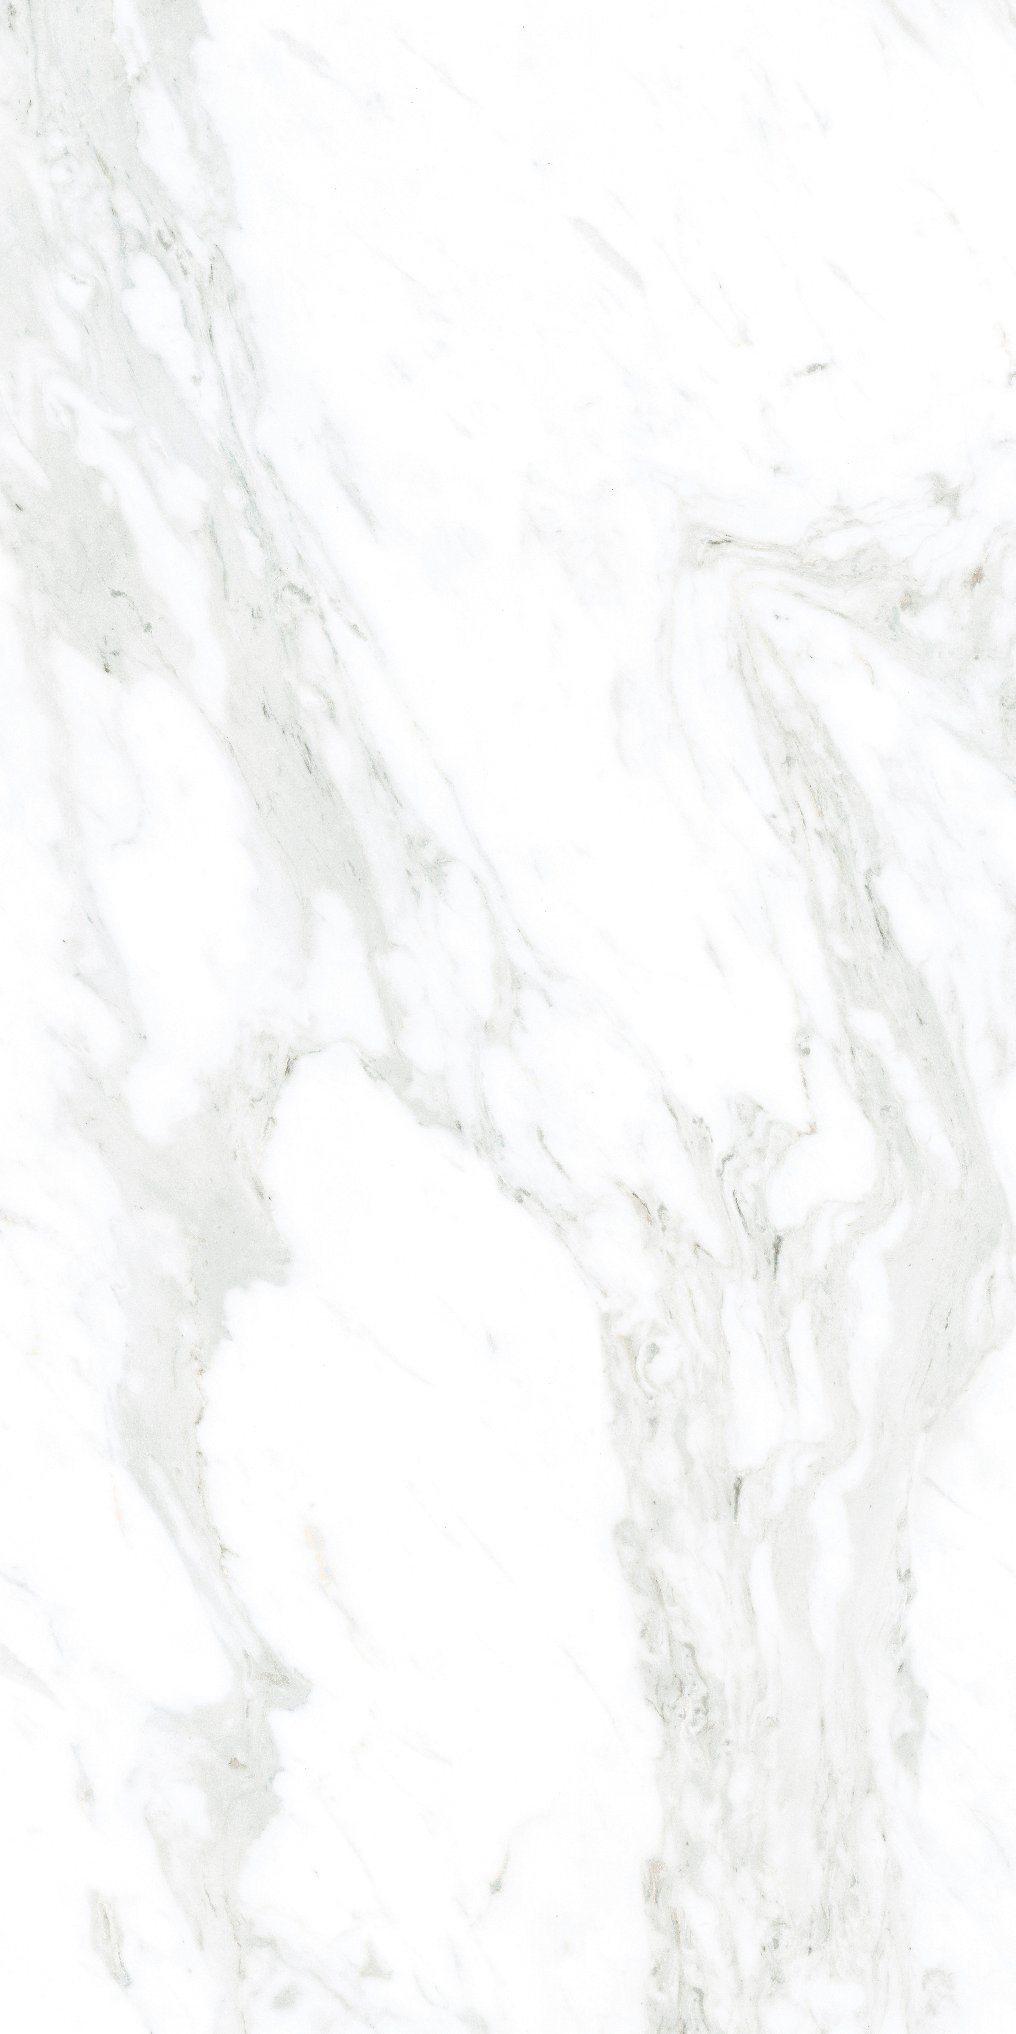 China new calacatta white thin tile for interior wall exterior new calacatta white thin tile for interior wall exterior wall for project floor tile dailygadgetfo Choice Image